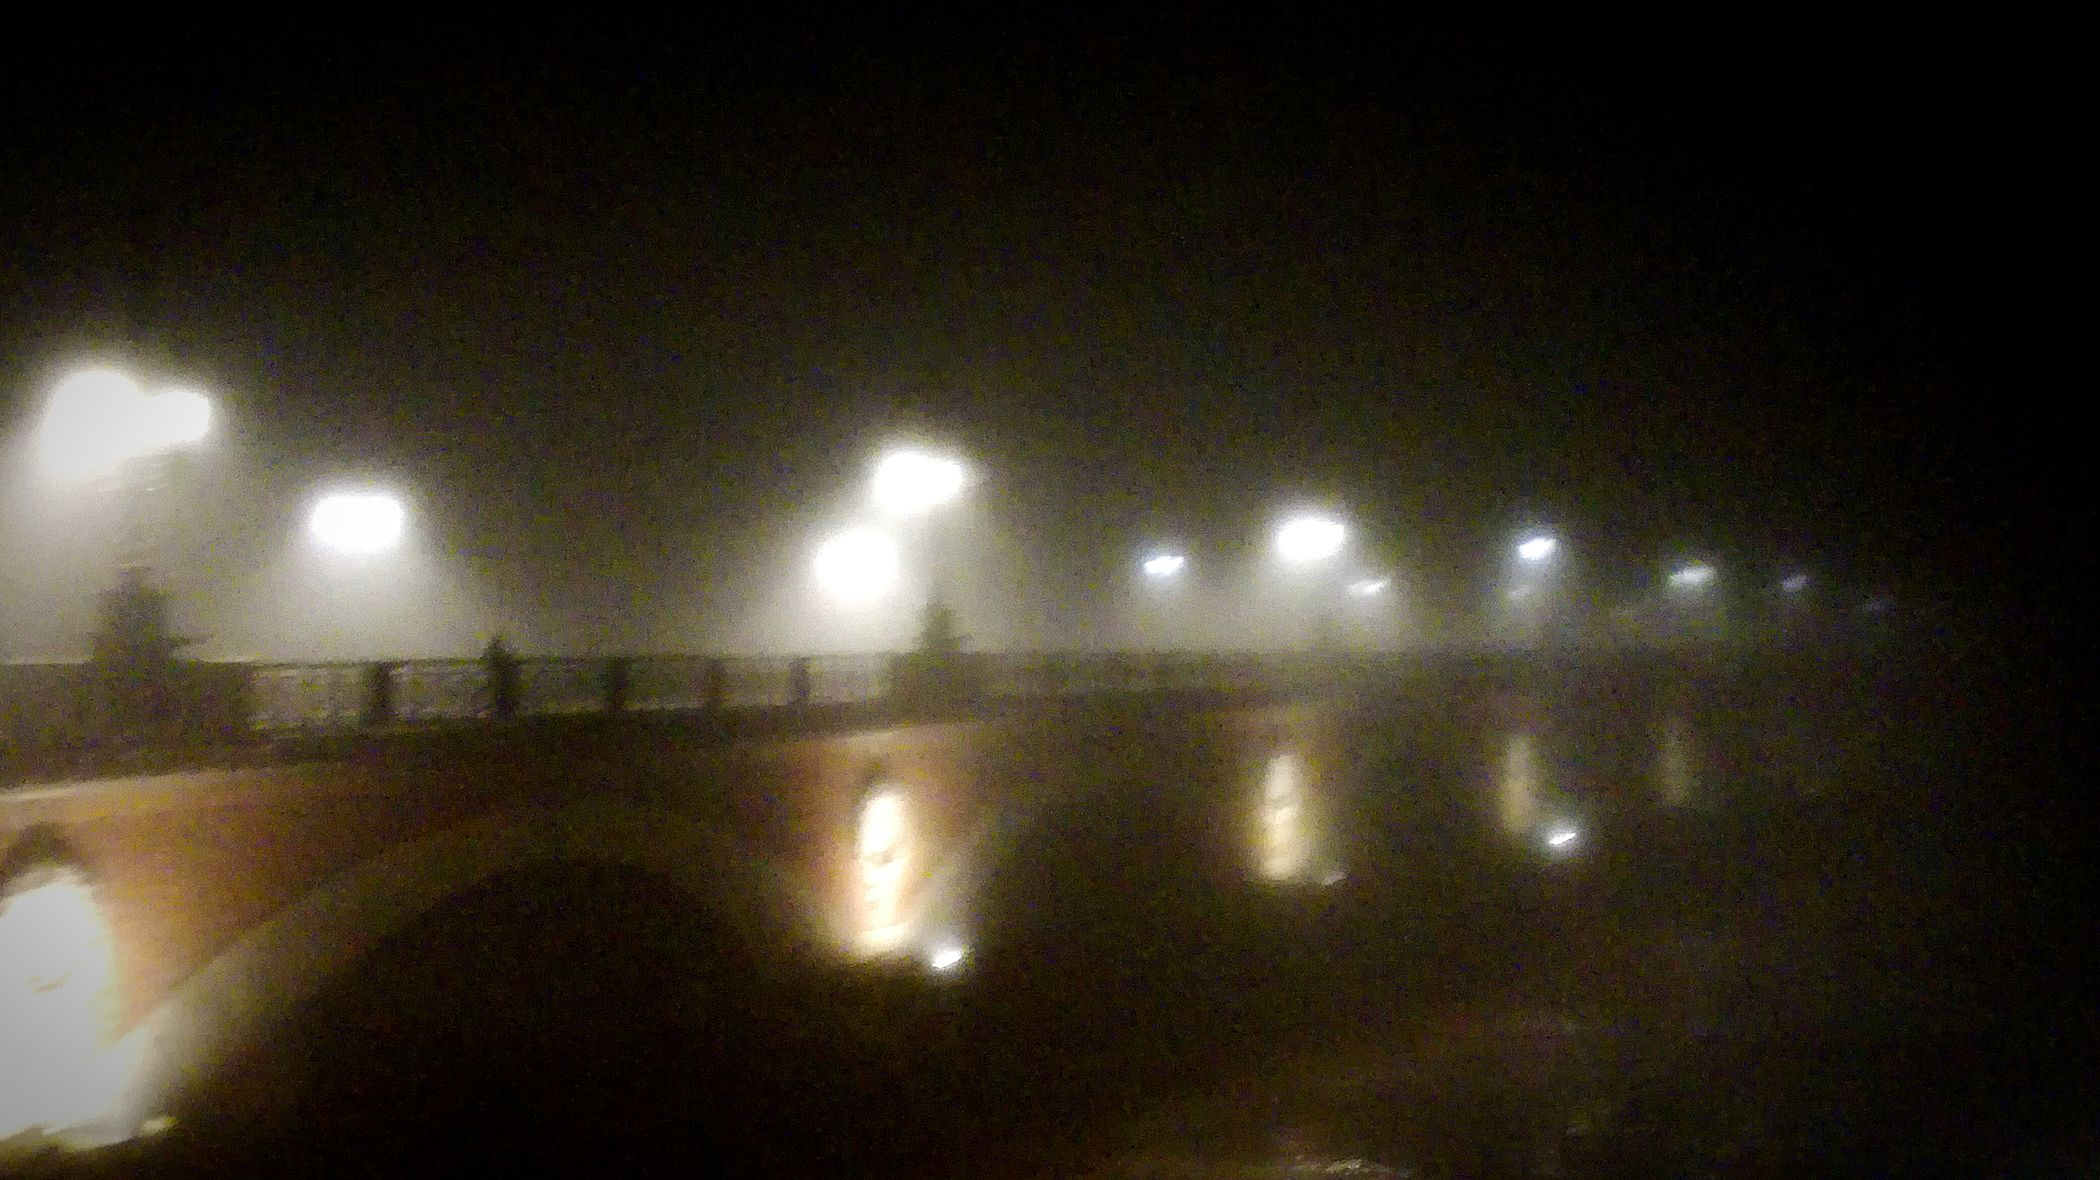 Nightphotography Night Illuminated Floodlight Spotlight Sky Pont Pont De Pierre Nuit Noire Outdoors